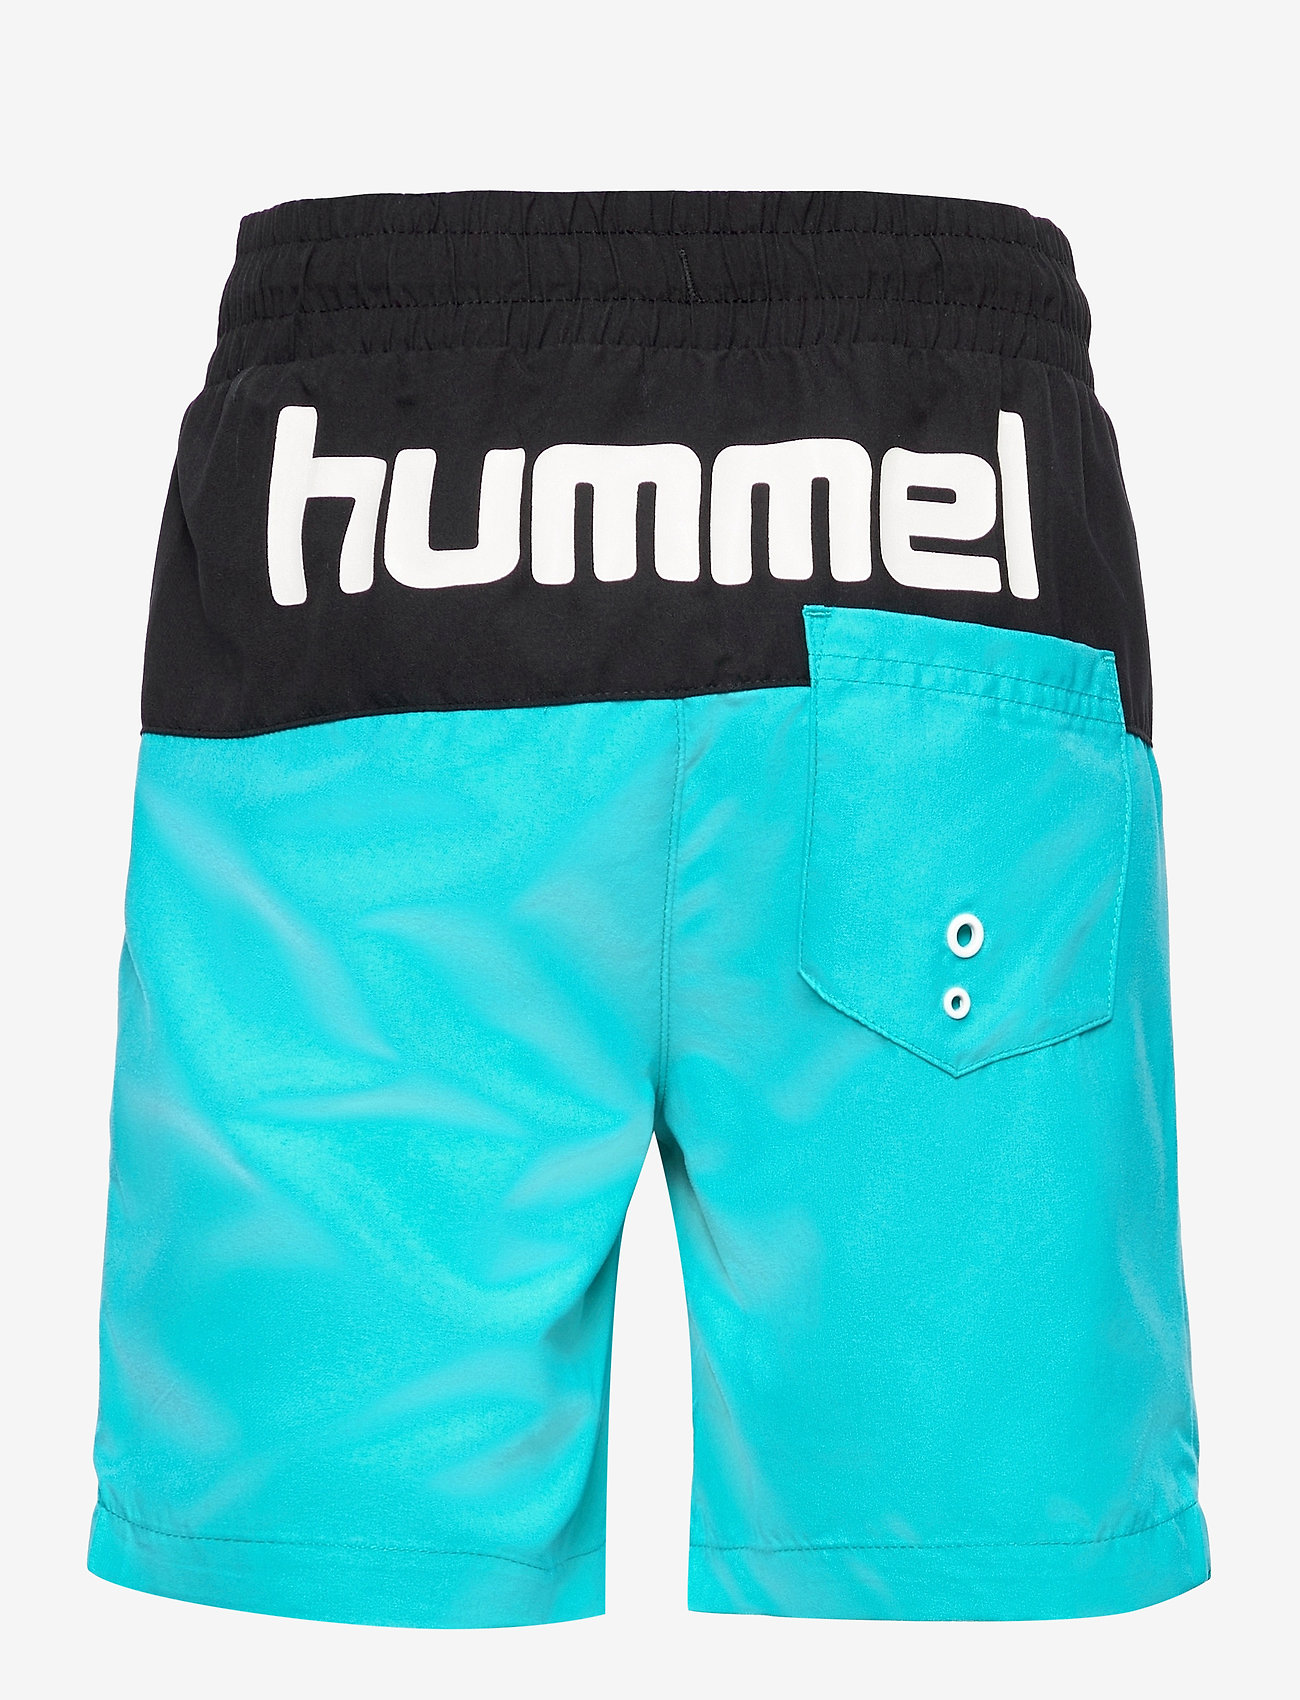 Hummel - hmlGARNER BOARD SHORTS - bademode - scuba blue - 1